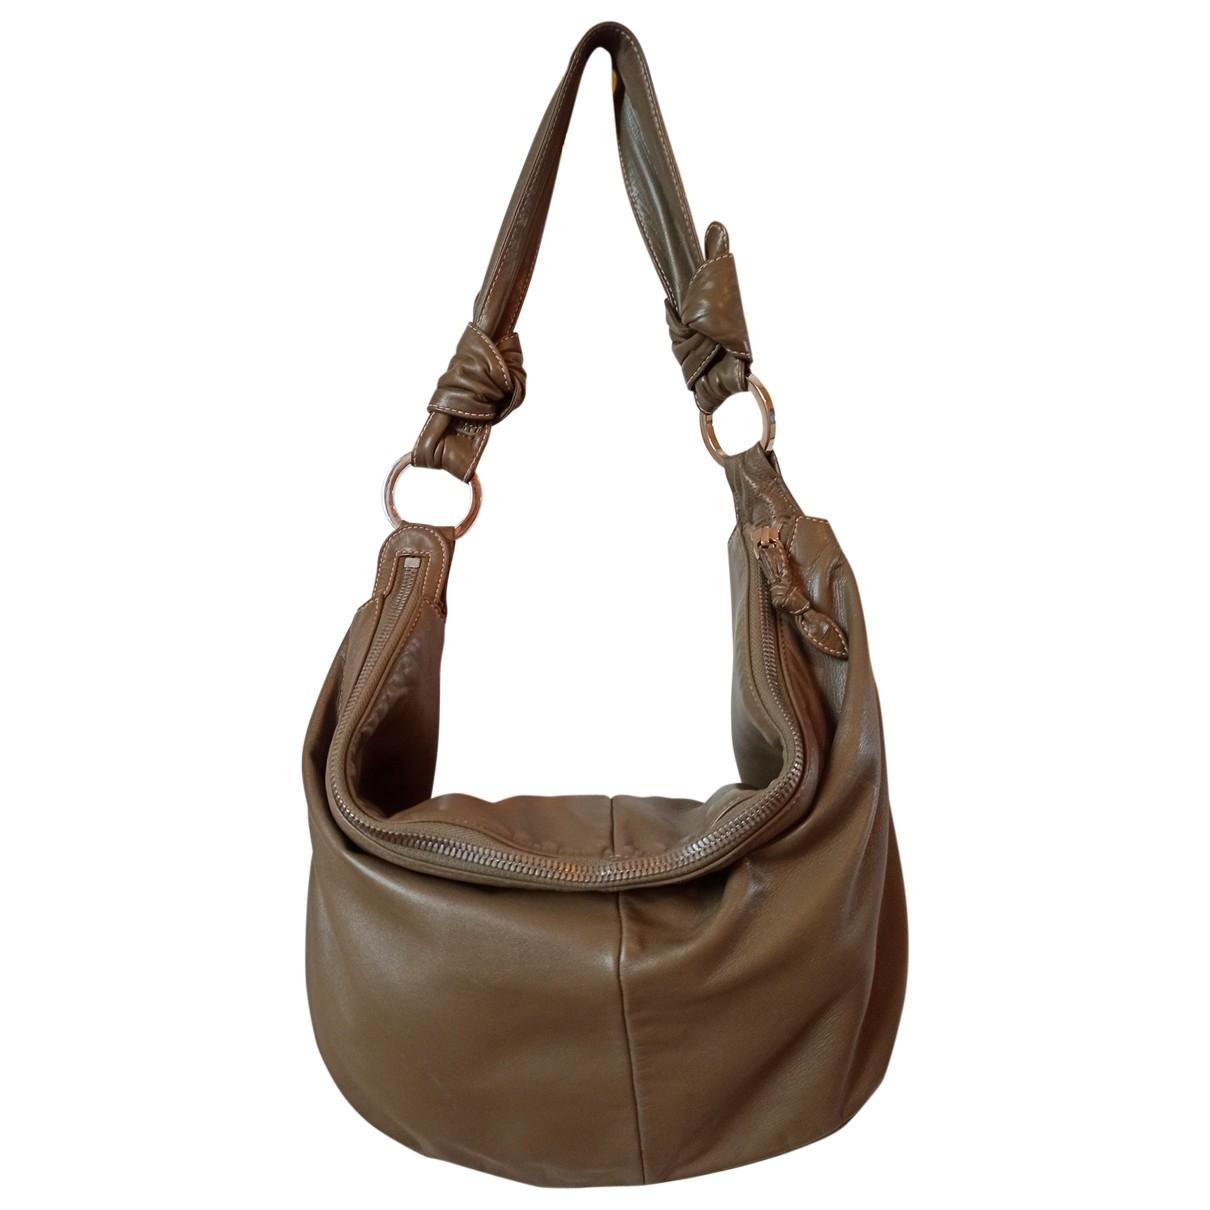 Loewe \N Khaki Leather handbag for Women \N